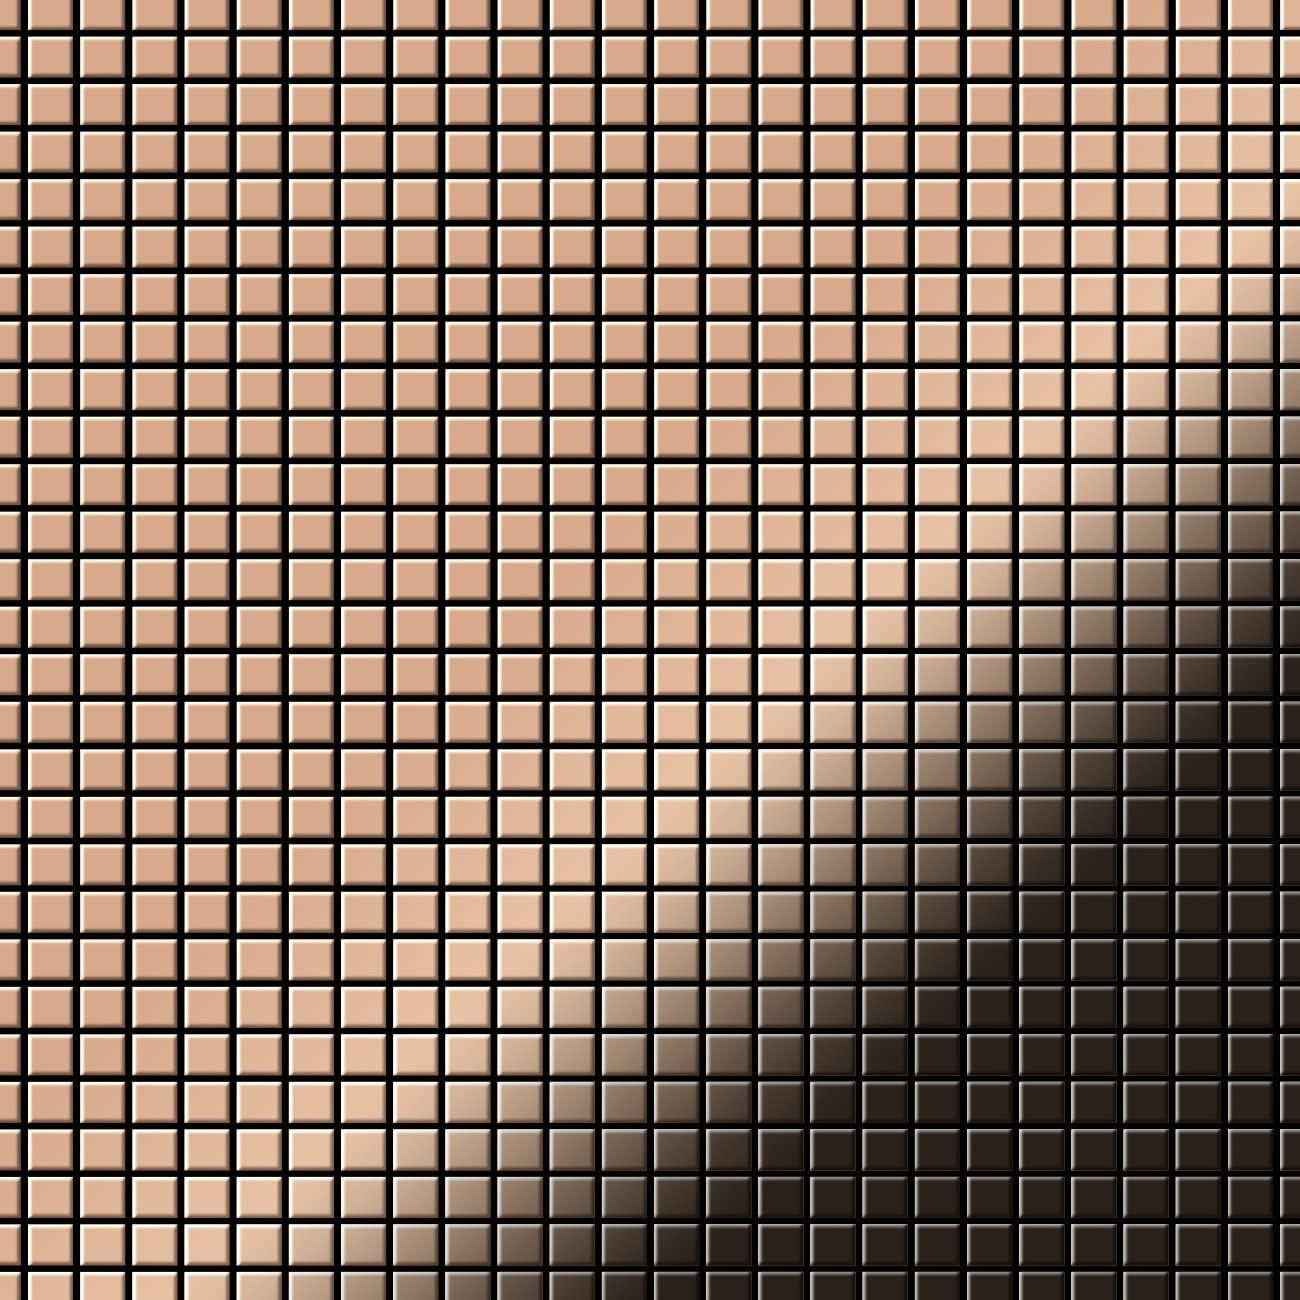 Mosaic Tile massiv Metal Copper Mill Copper 1.6mm Thick ALLOY Glomesh-cm